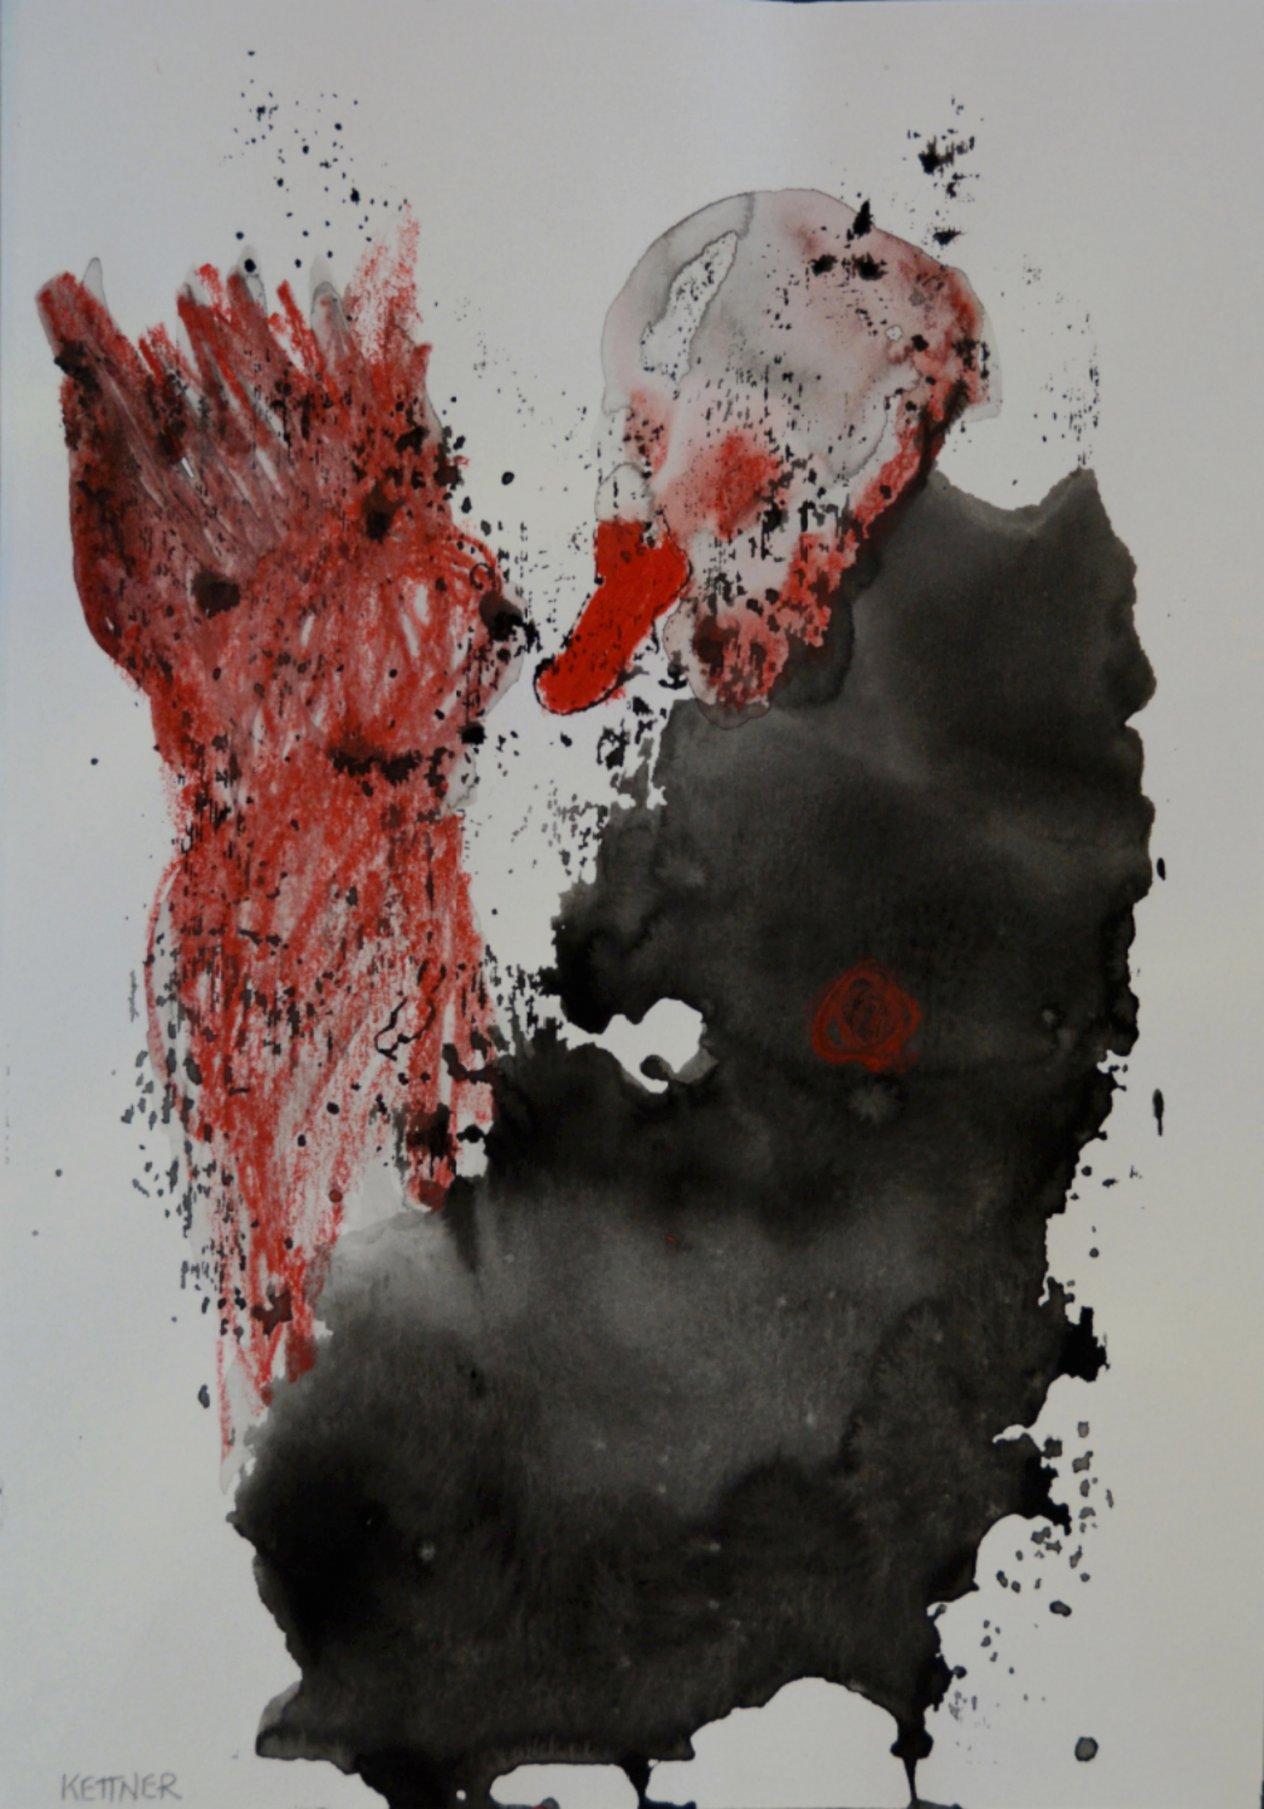 Puppy (2019) - Florencia Kettner